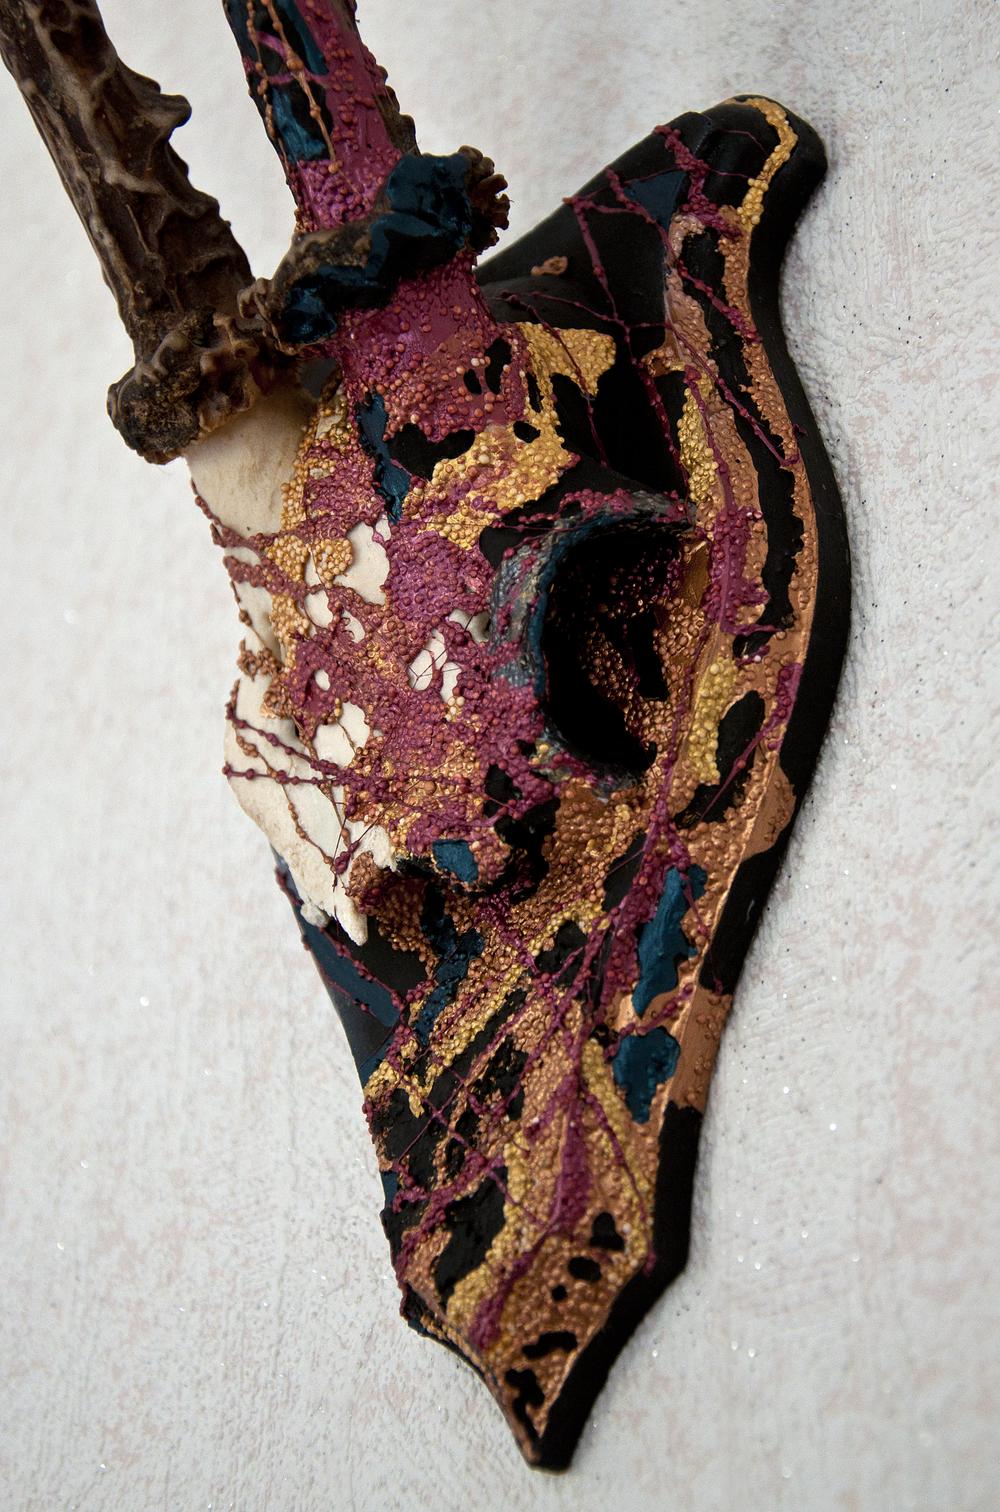 petra-shara-stoor-skull-art-misurath-3.png